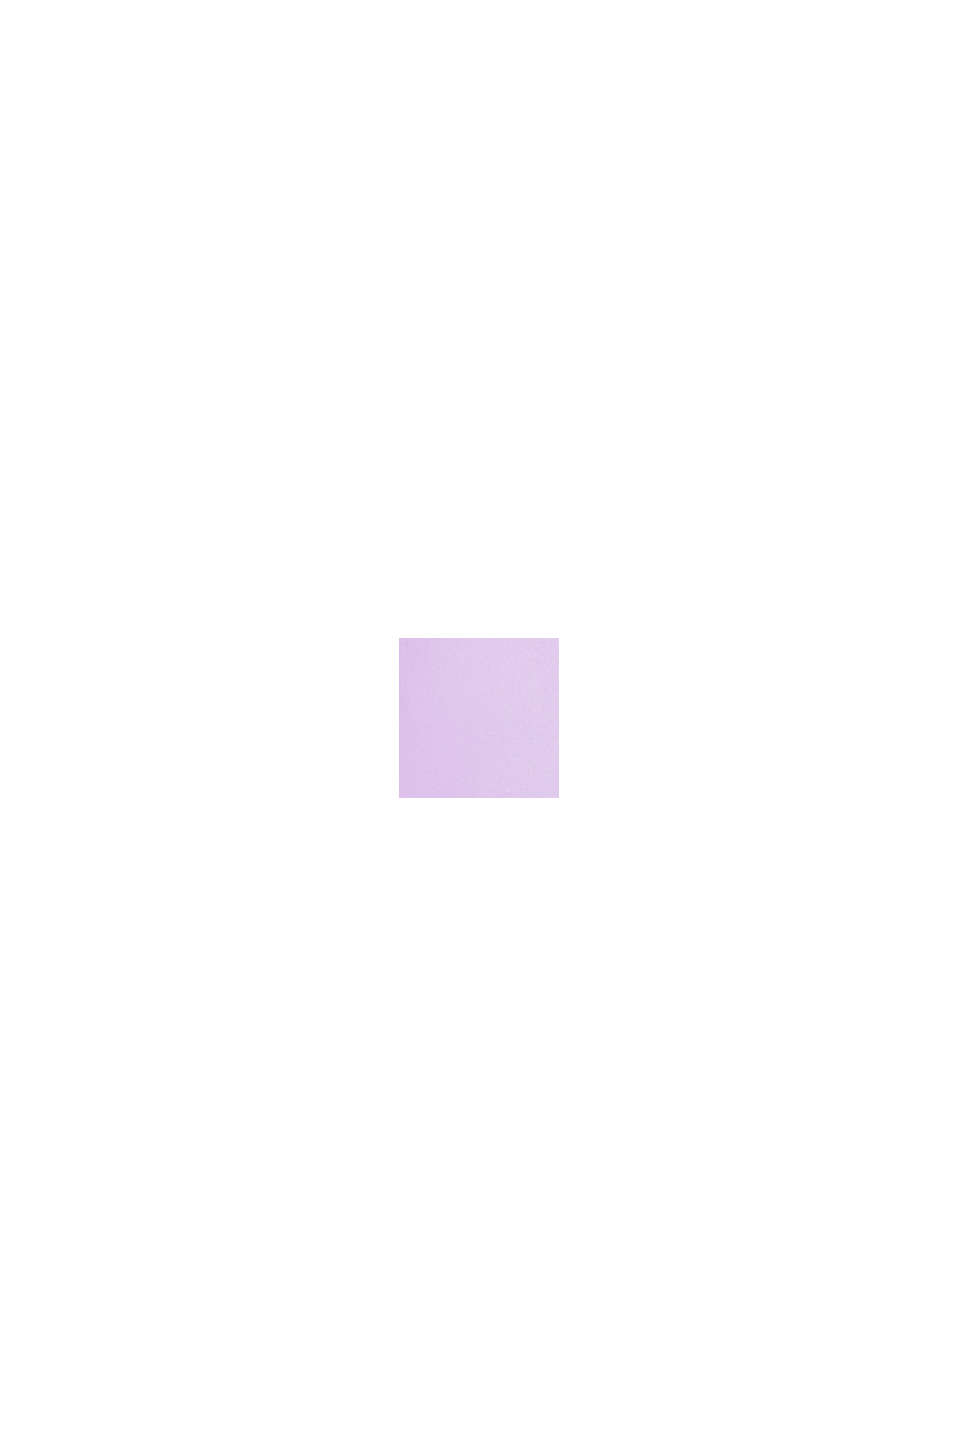 Maillot de bain à logo #throwback, PURPLE, swatch